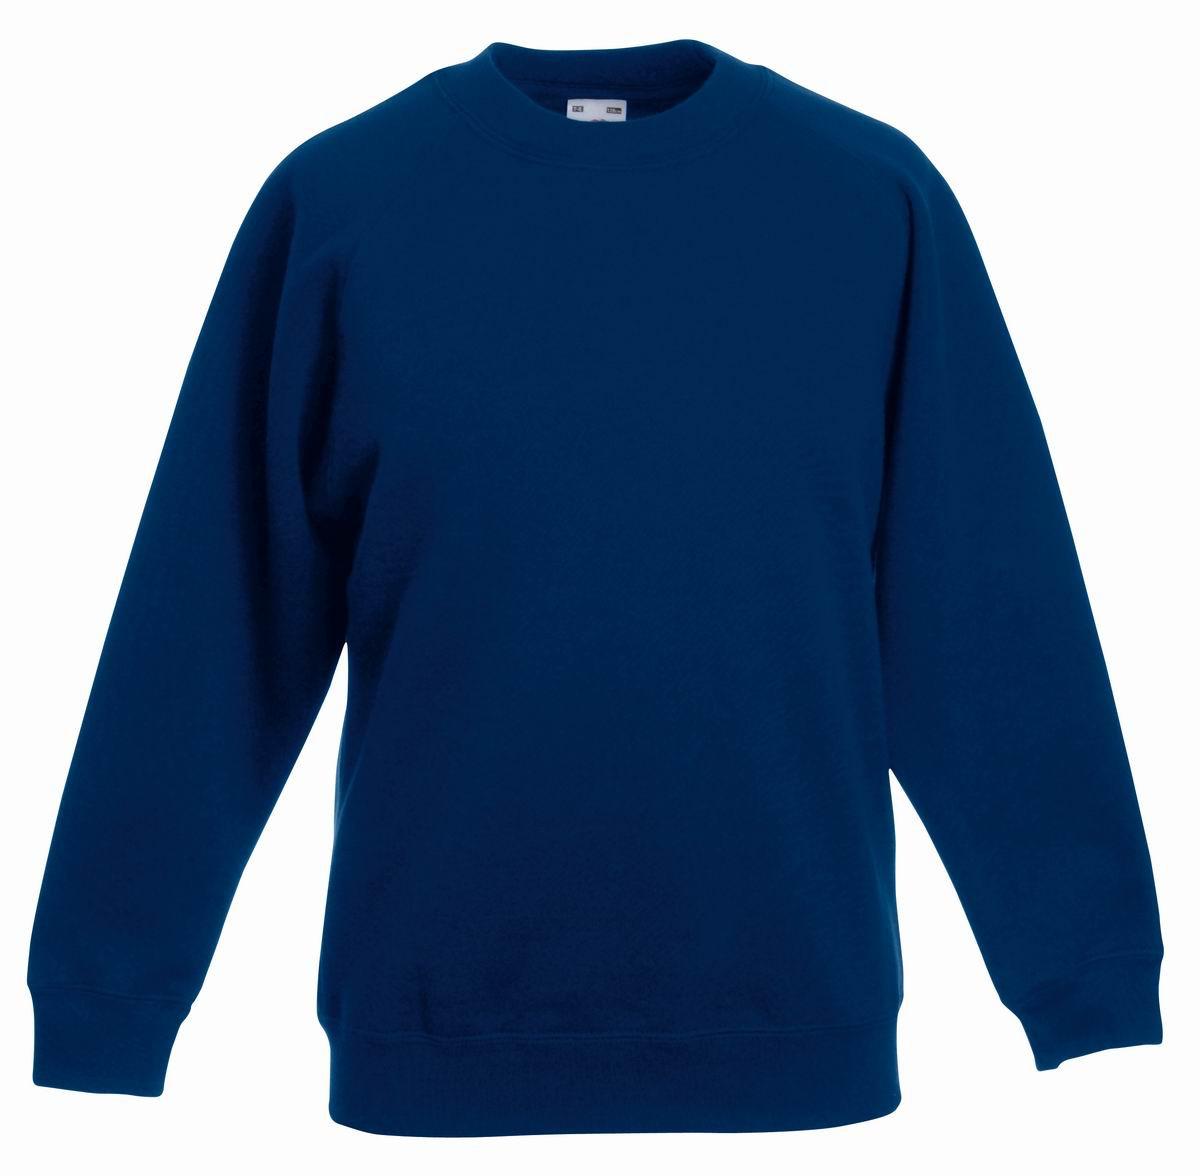 Толстовка детская Classic Kids Raglan Sweat, рост 128 (7-8лет), Тёмно-синий